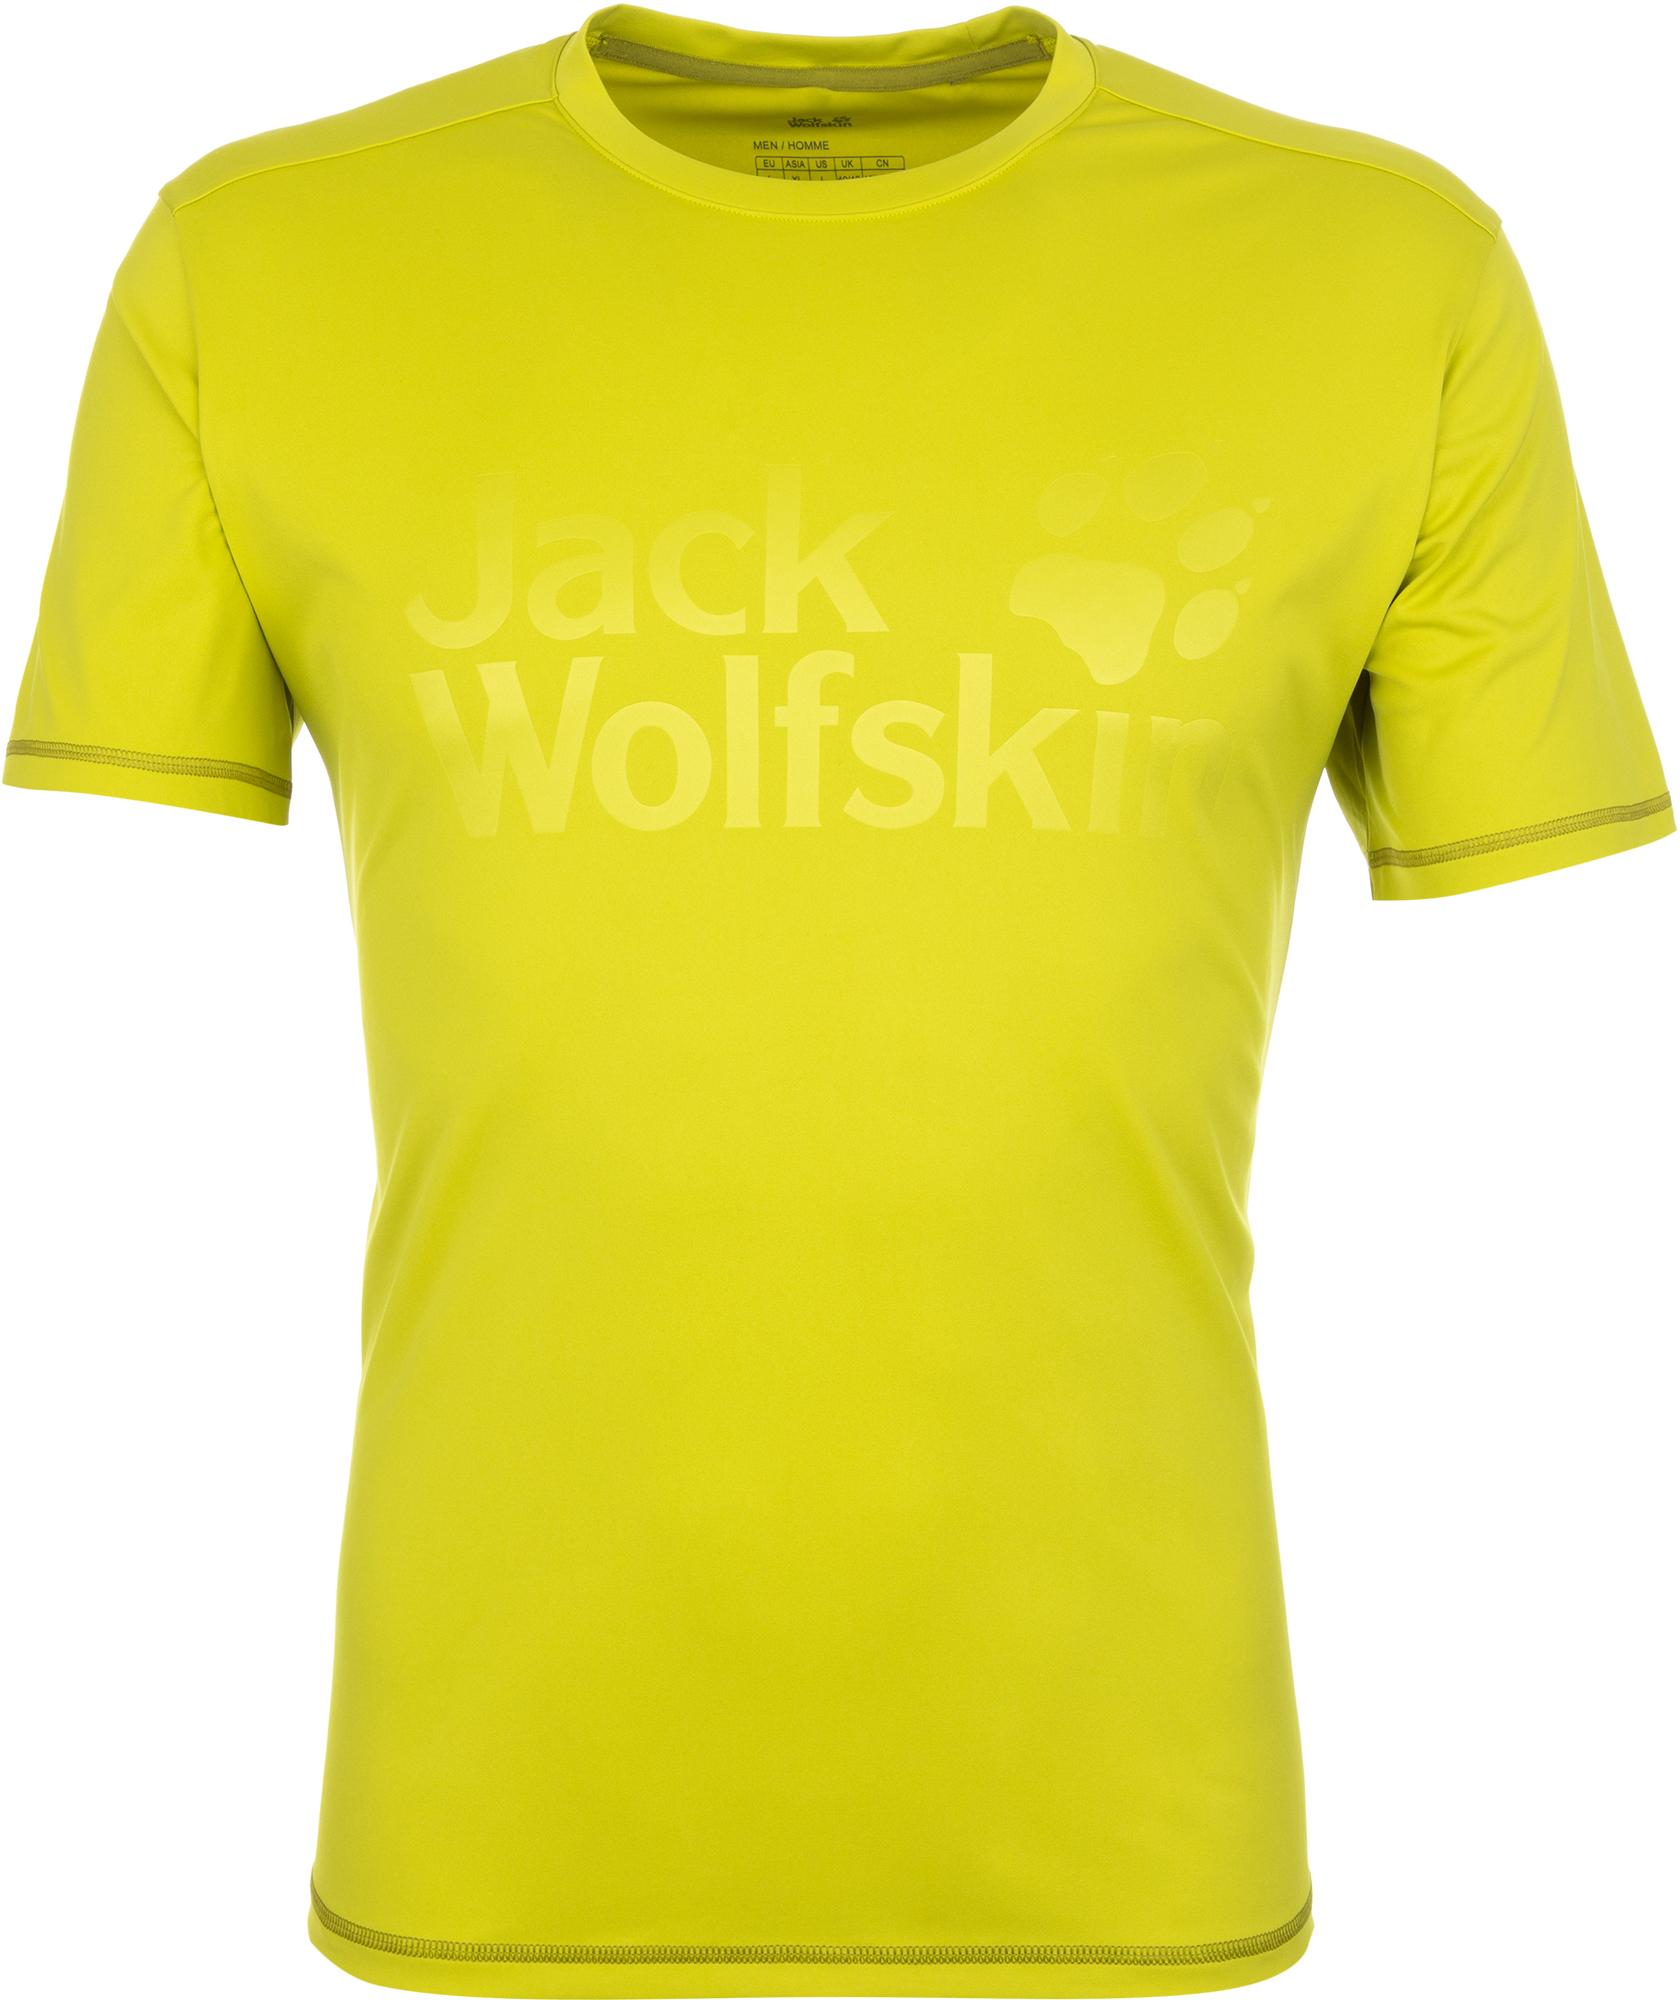 купить JACK WOLFSKIN Футболка мужская JACK WOLFSKIN Sierra, размер 54-56 по цене 2639 рублей